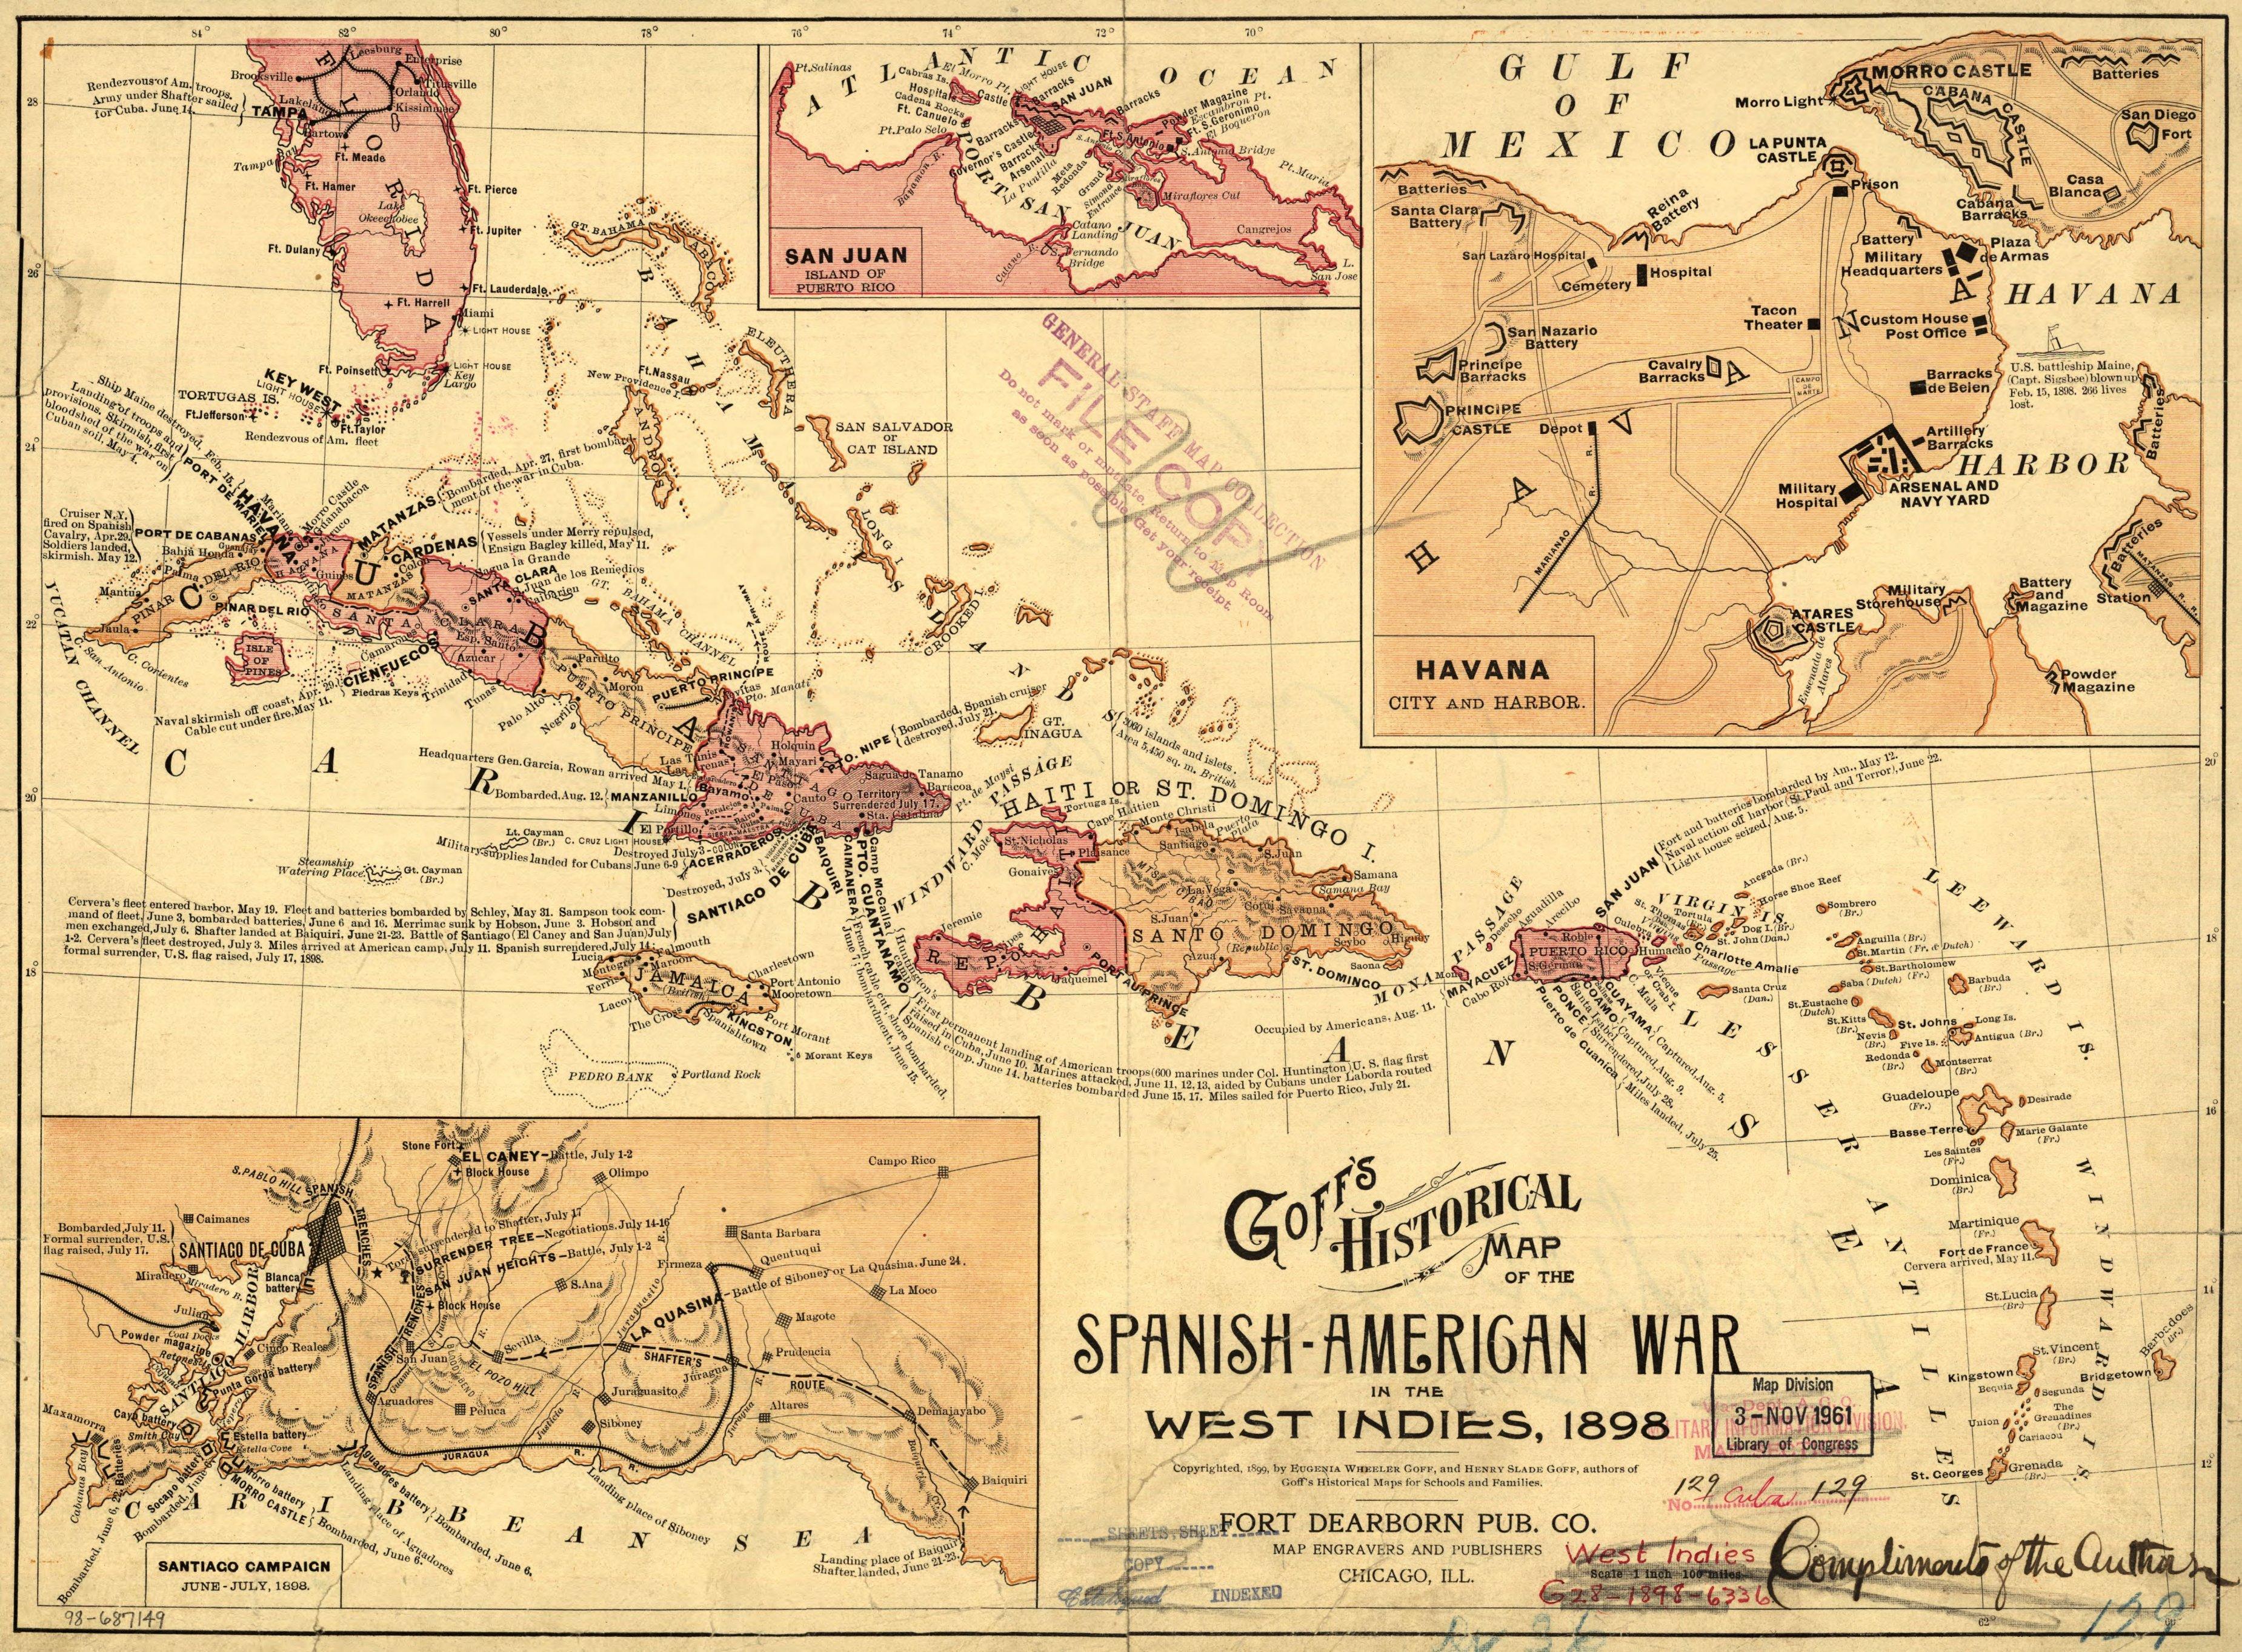 War_with_Spain-1898.jpg